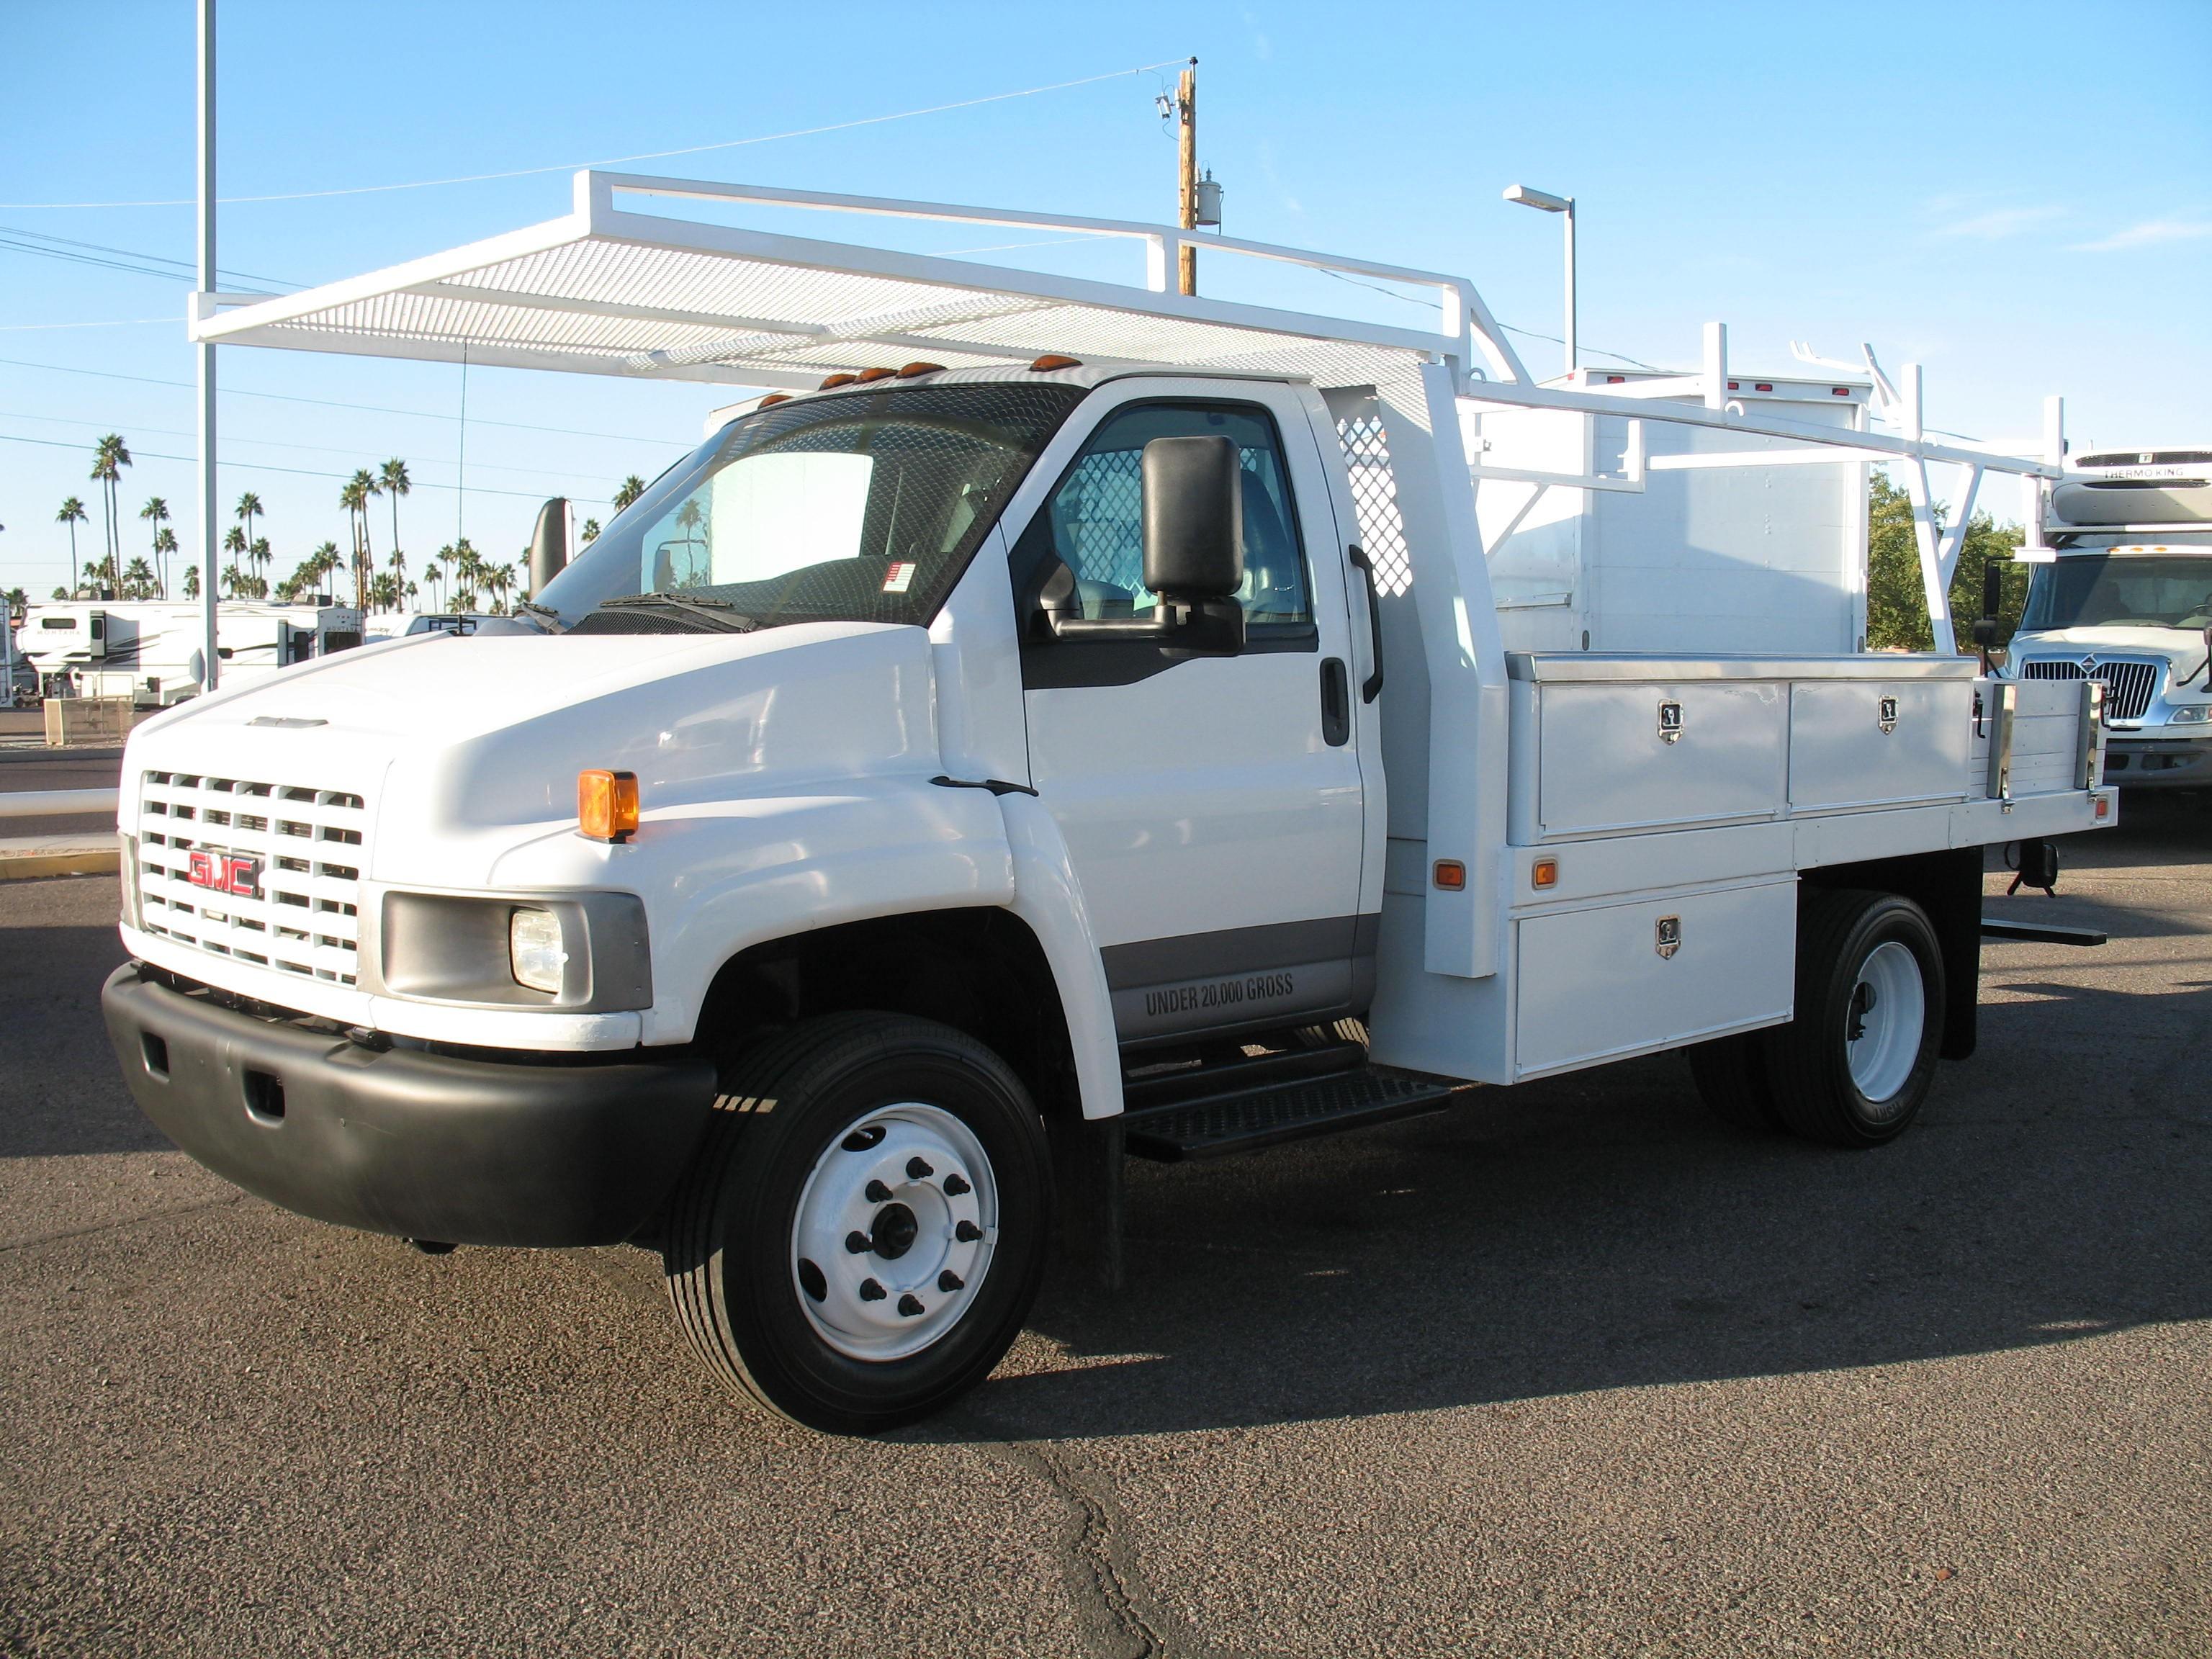 Used, 2006, GMC, C-5500 Topkick, Service / Utility Trucks